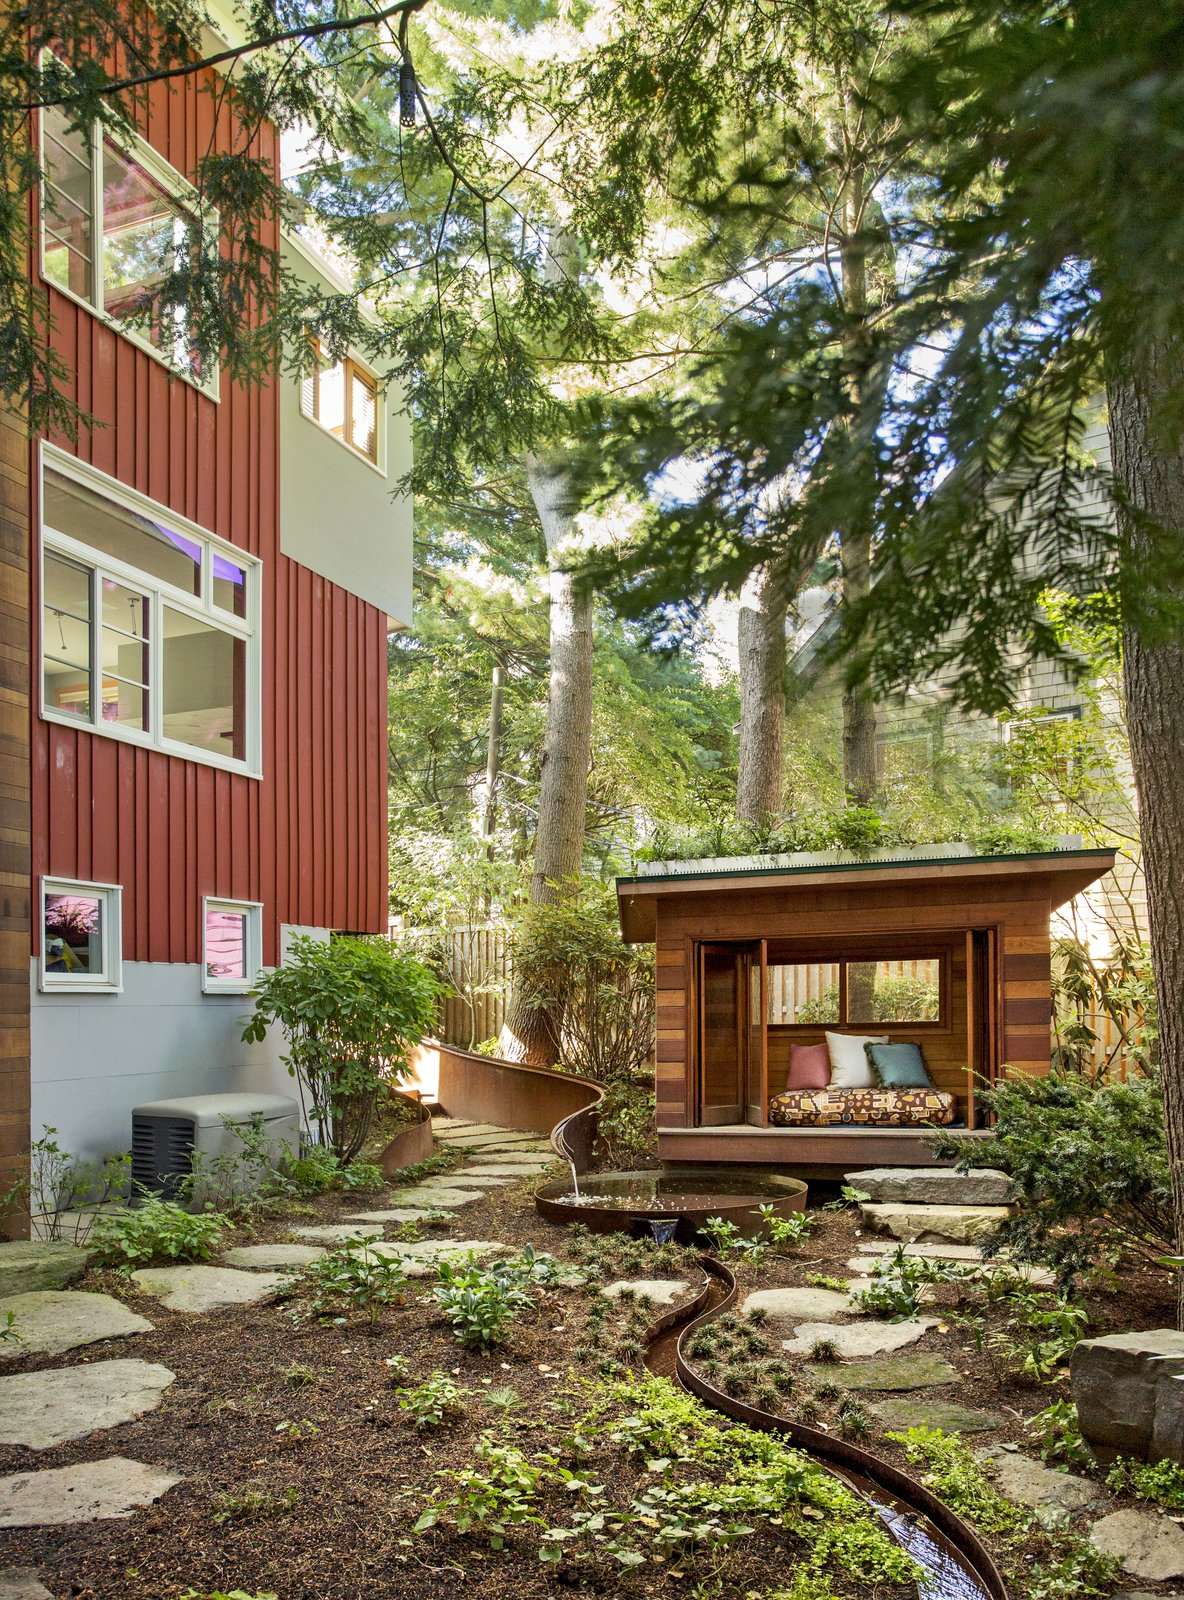 The meditation hut set in the garden designed by Julie Moir Messervy Design Studio (JMMDS).